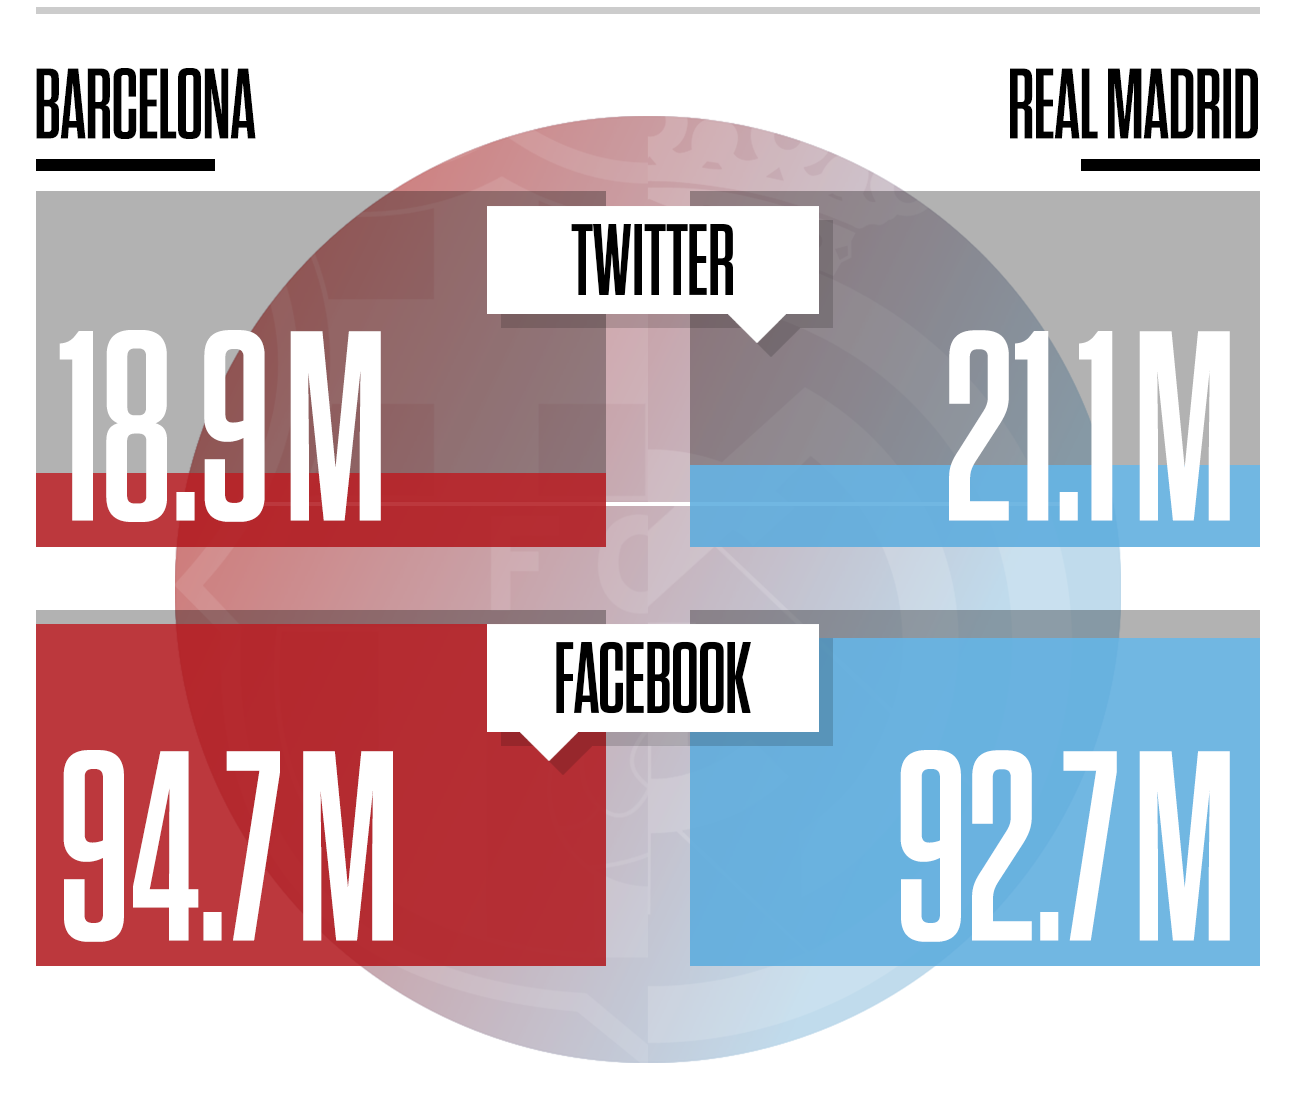 El Clasico: Just how big is the rivalry between Barcelona